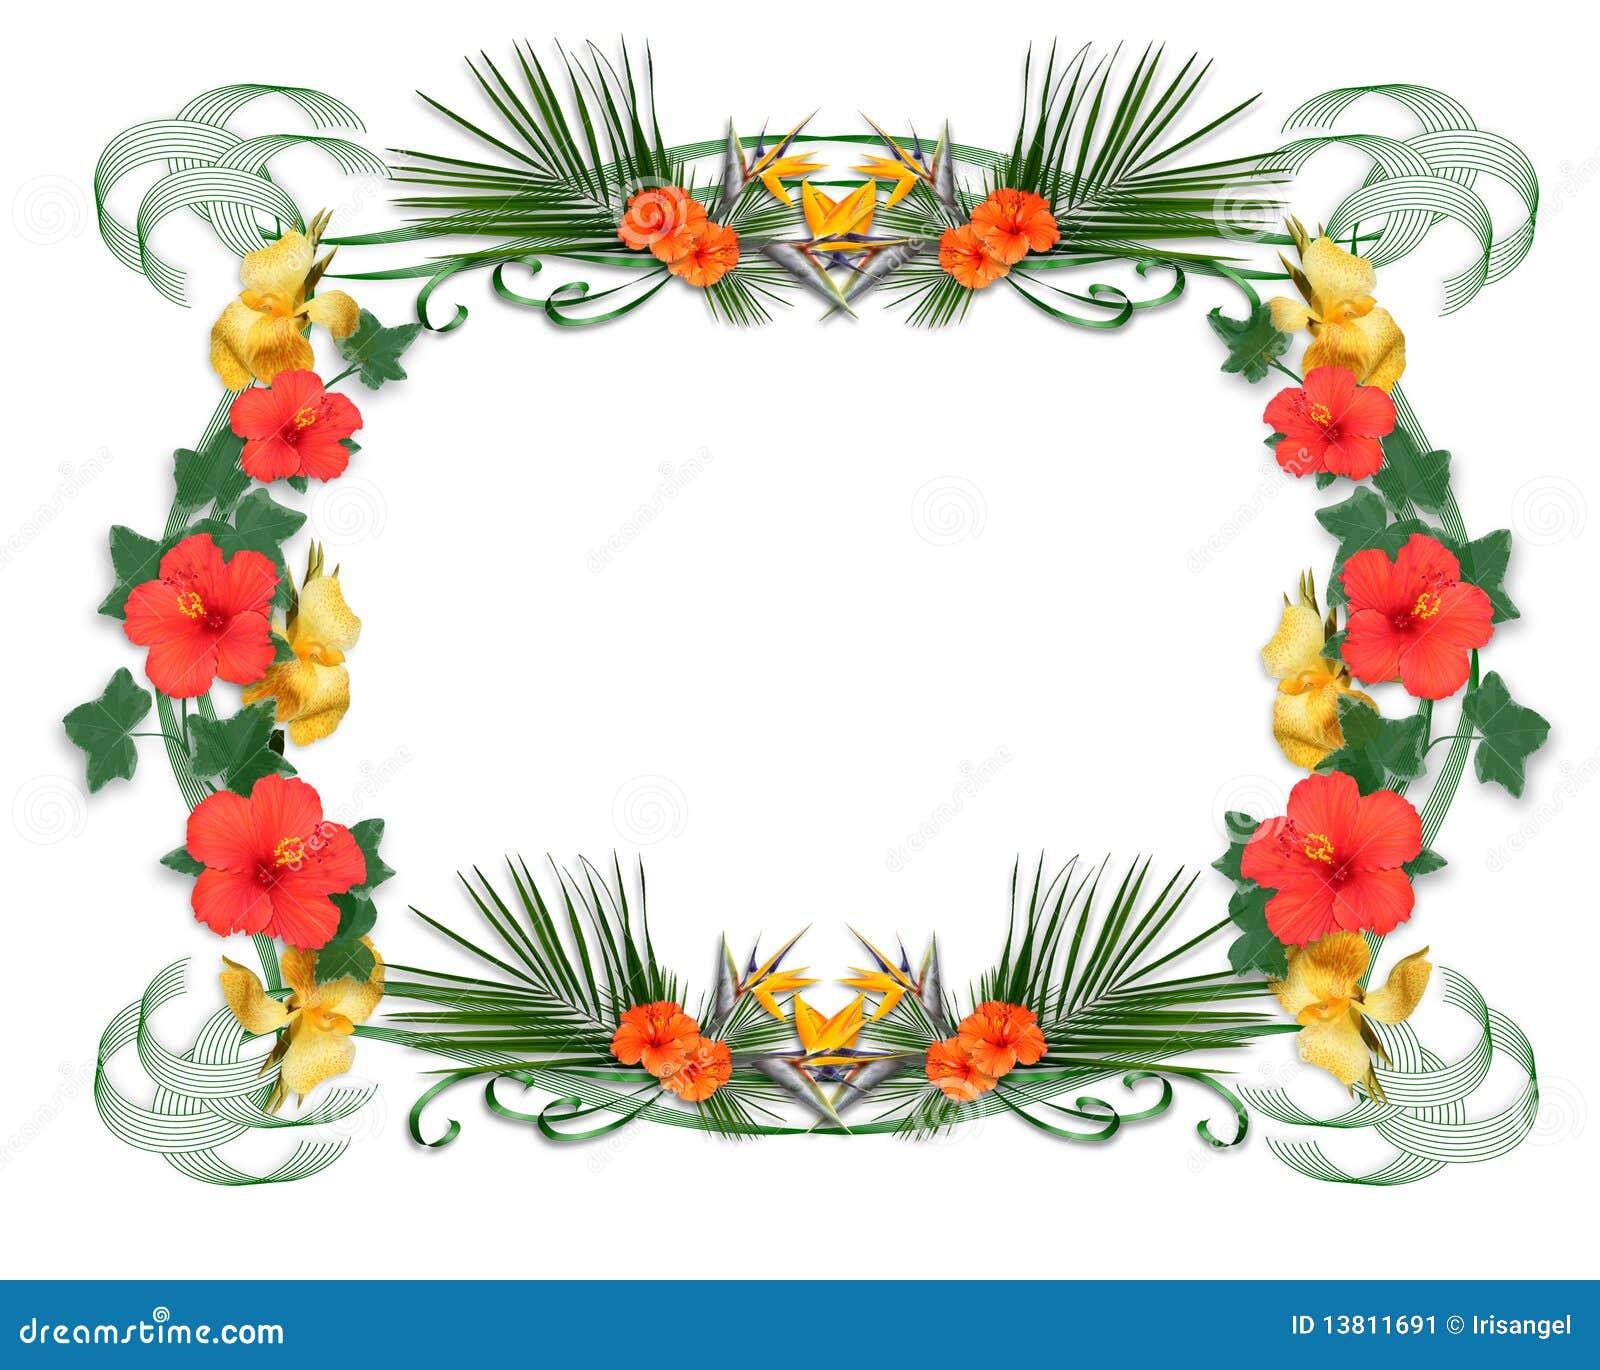 Tropical Border tropical flowers border stock image - image: 13811691